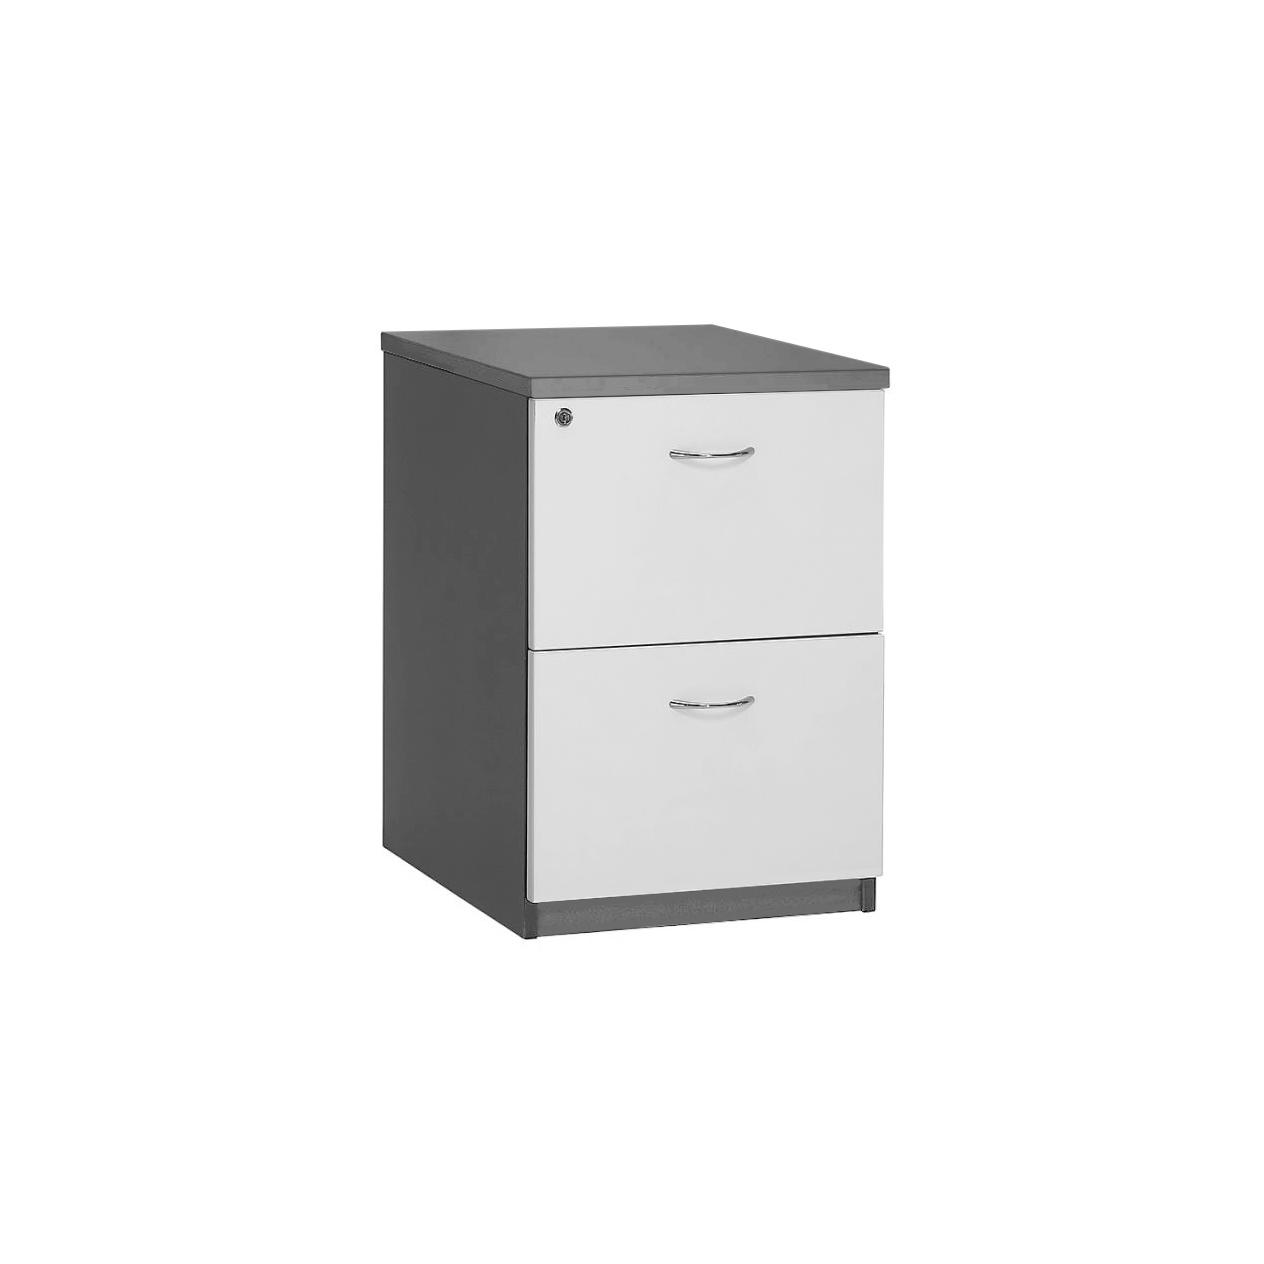 Fixed Pedestal 2 Drawer Neel Group